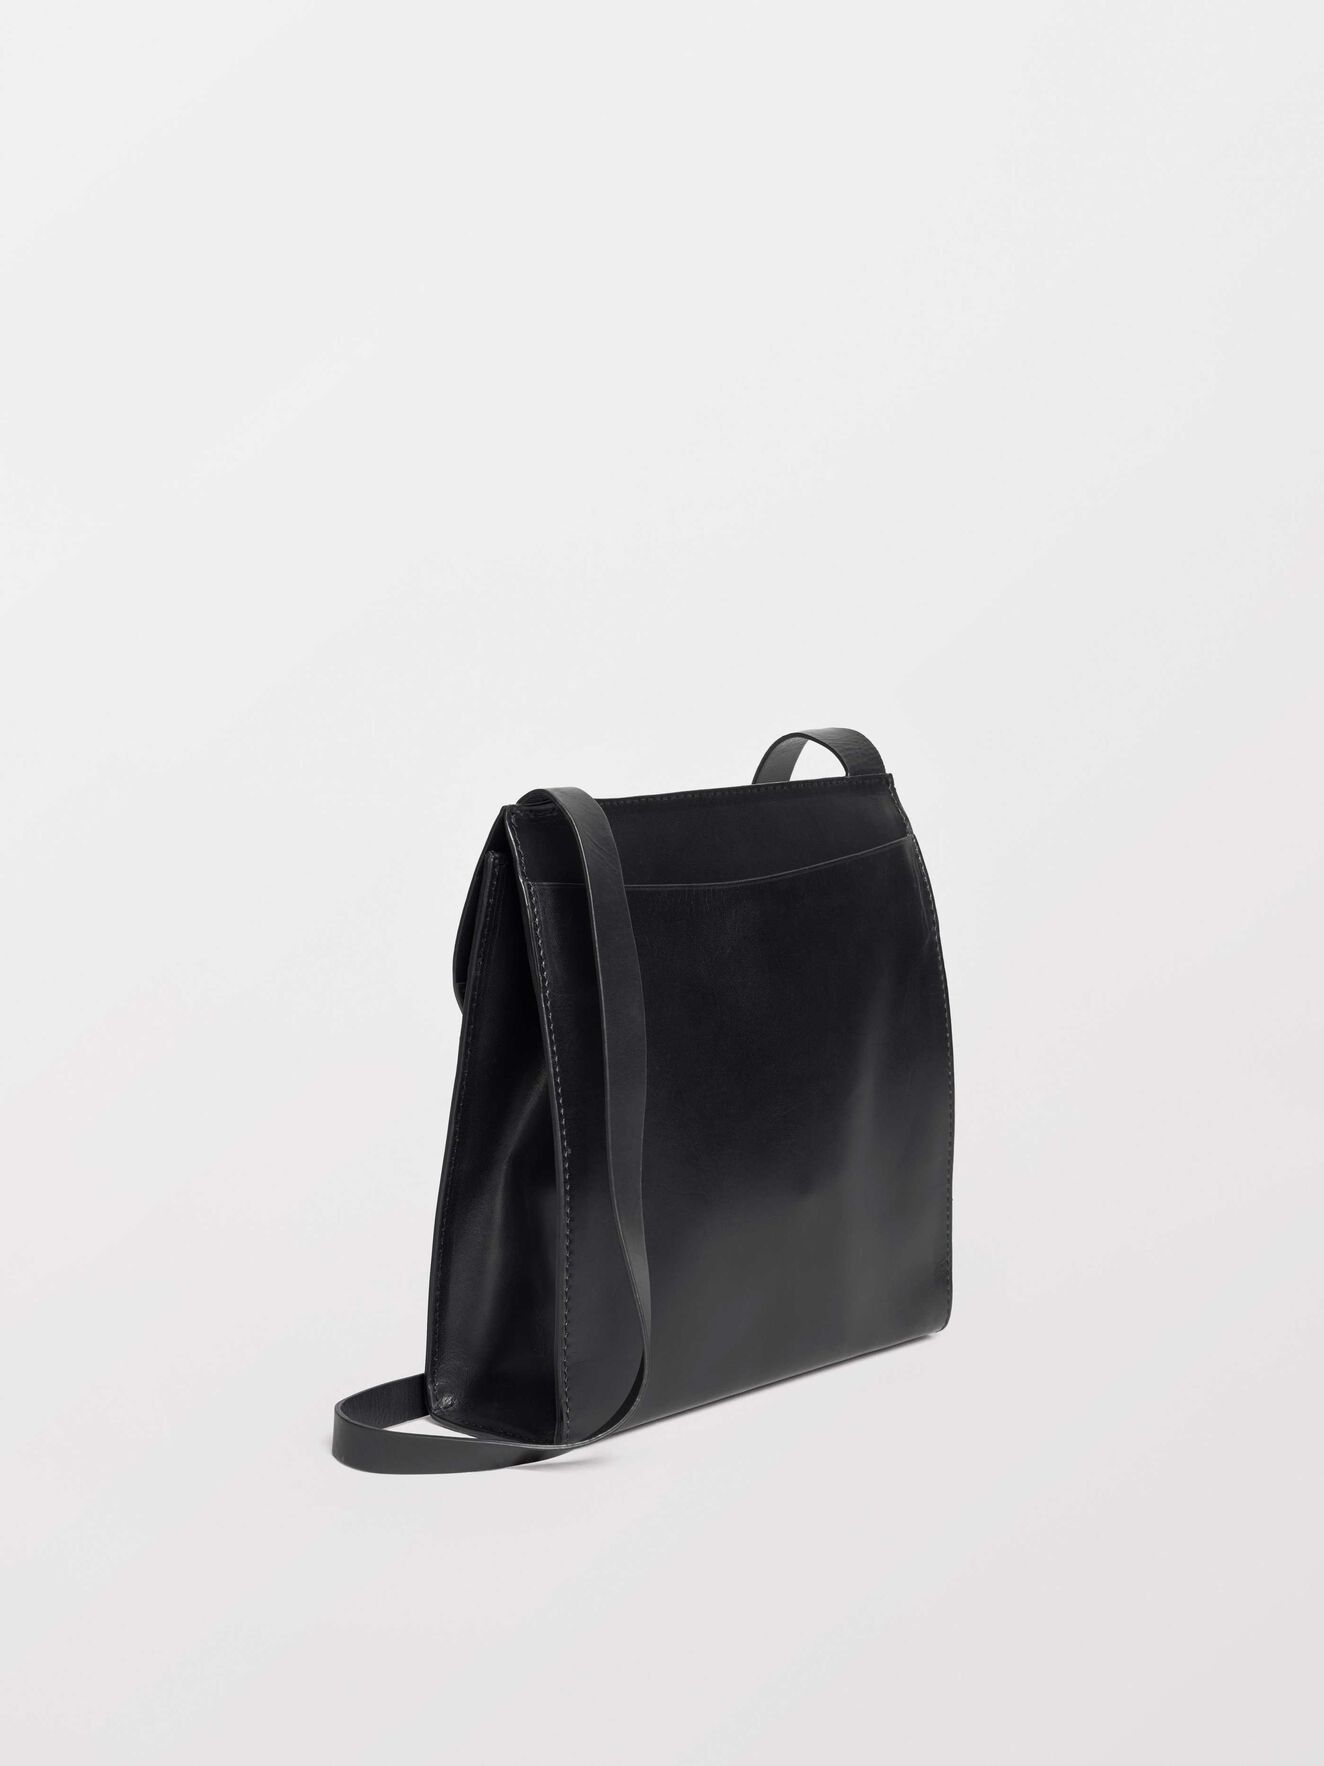 Barron Crossbody Bag in Black from Tiger of Sweden